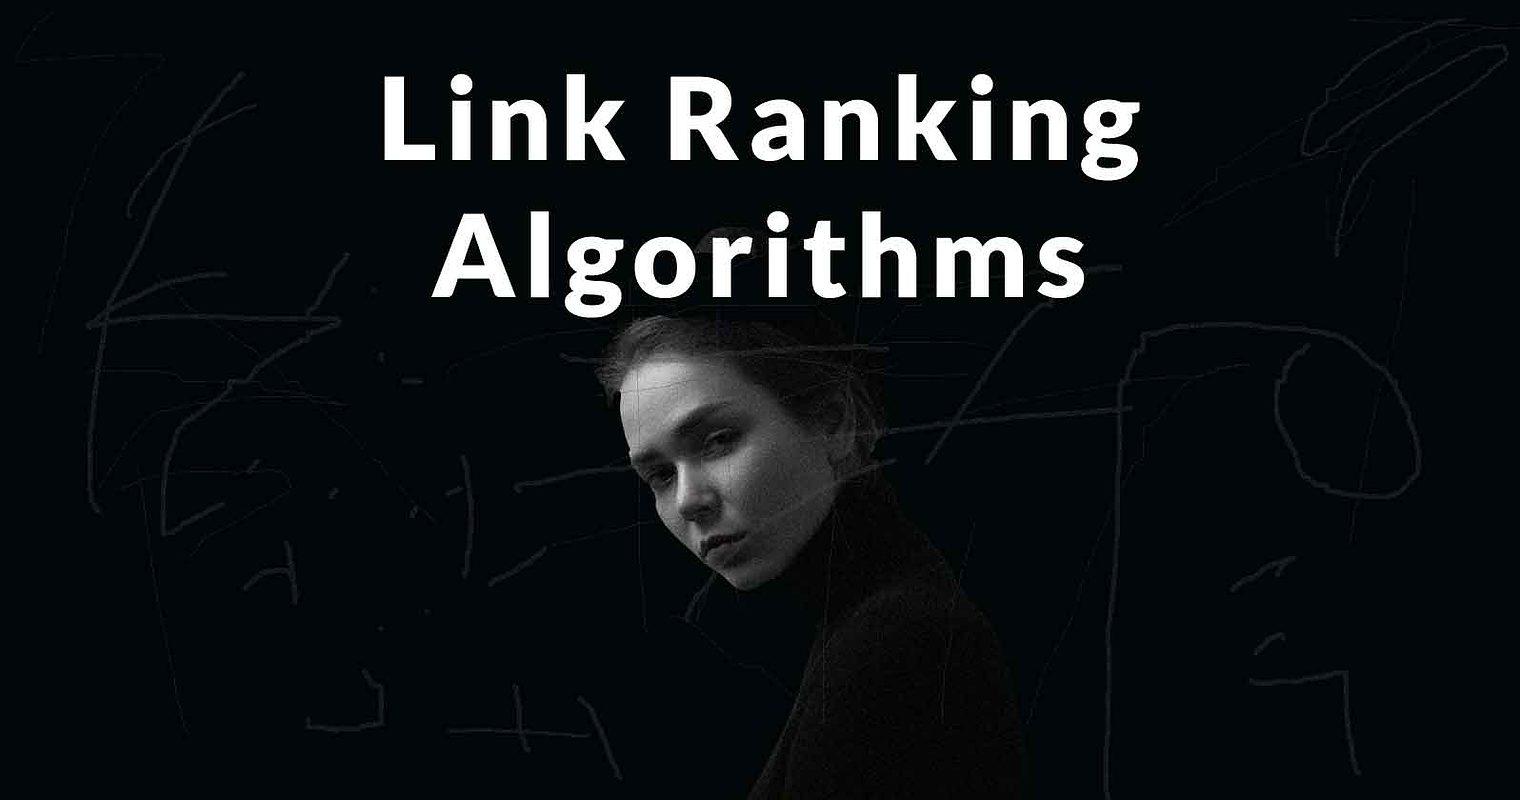 The Forgotten History of Link Ranking Algorithms